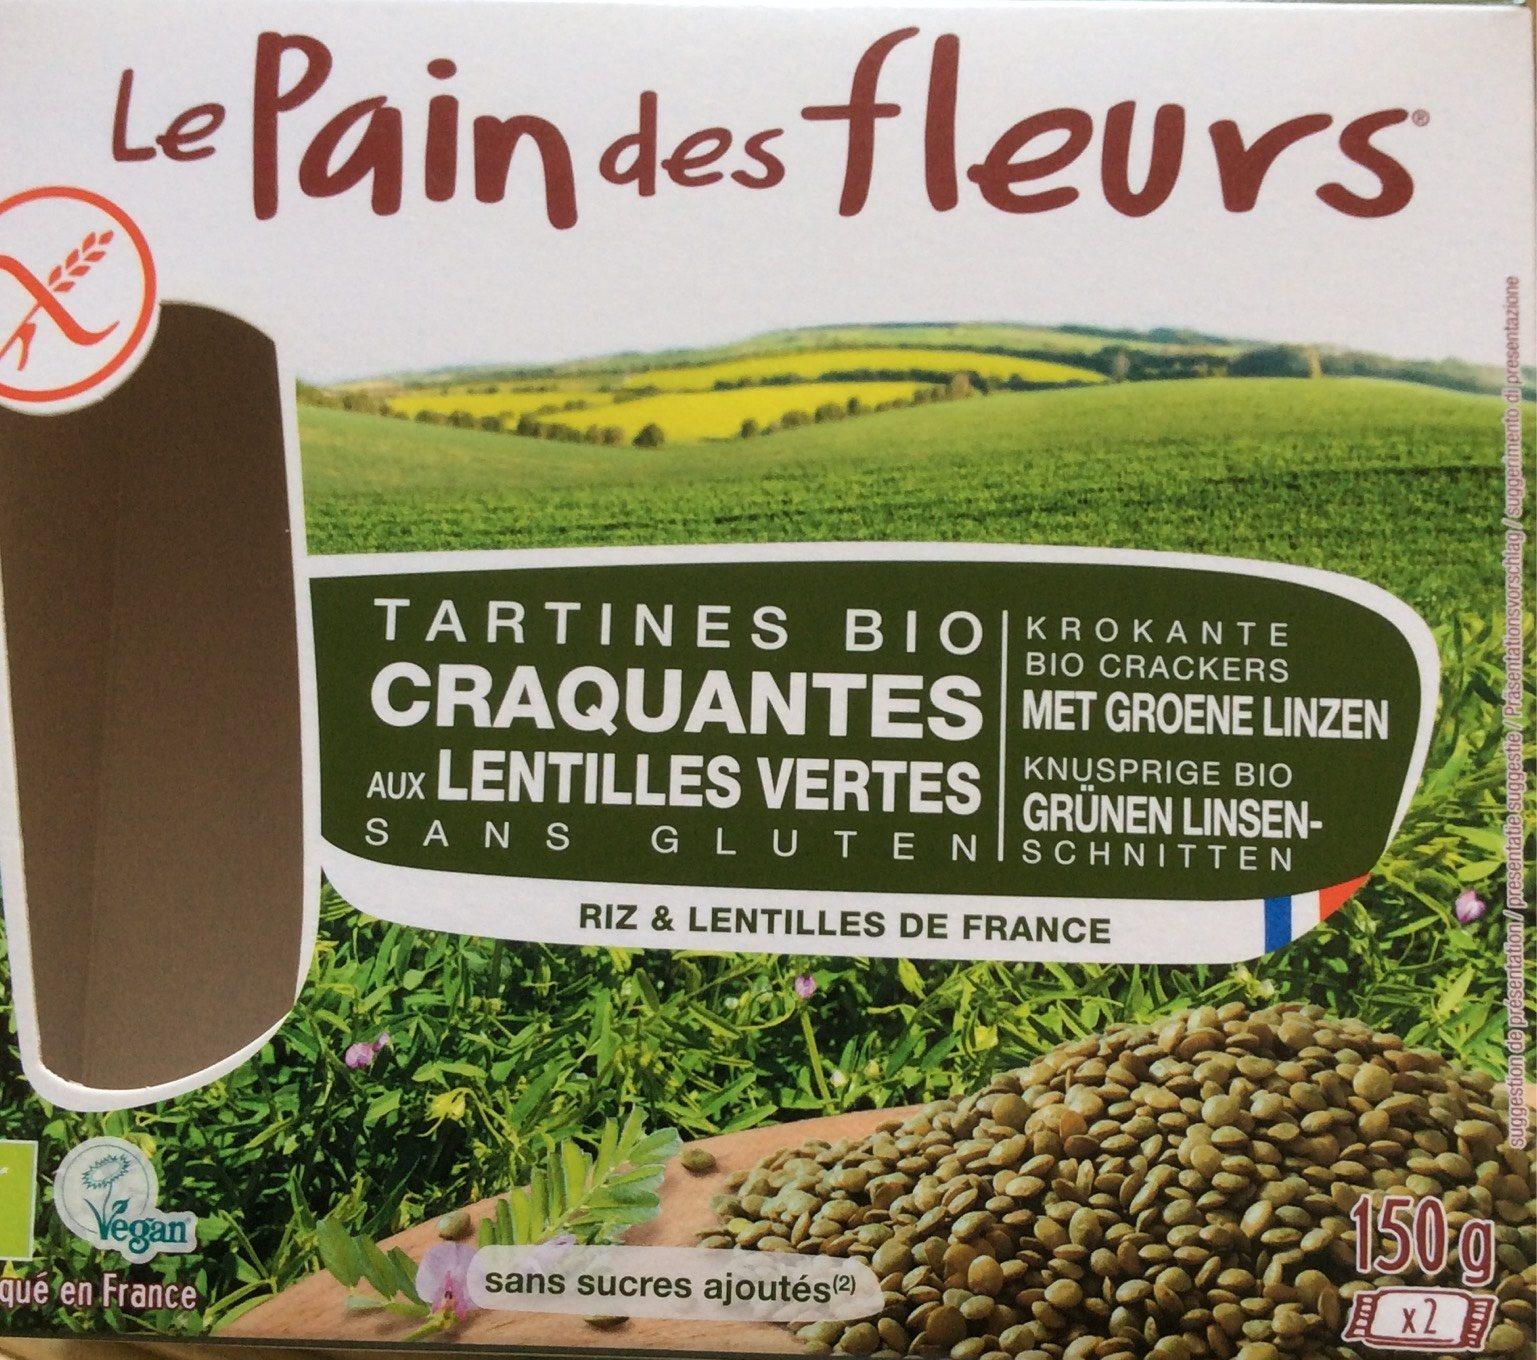 Tartines Bio craquantes aux lentilles vertes - Produit - fr